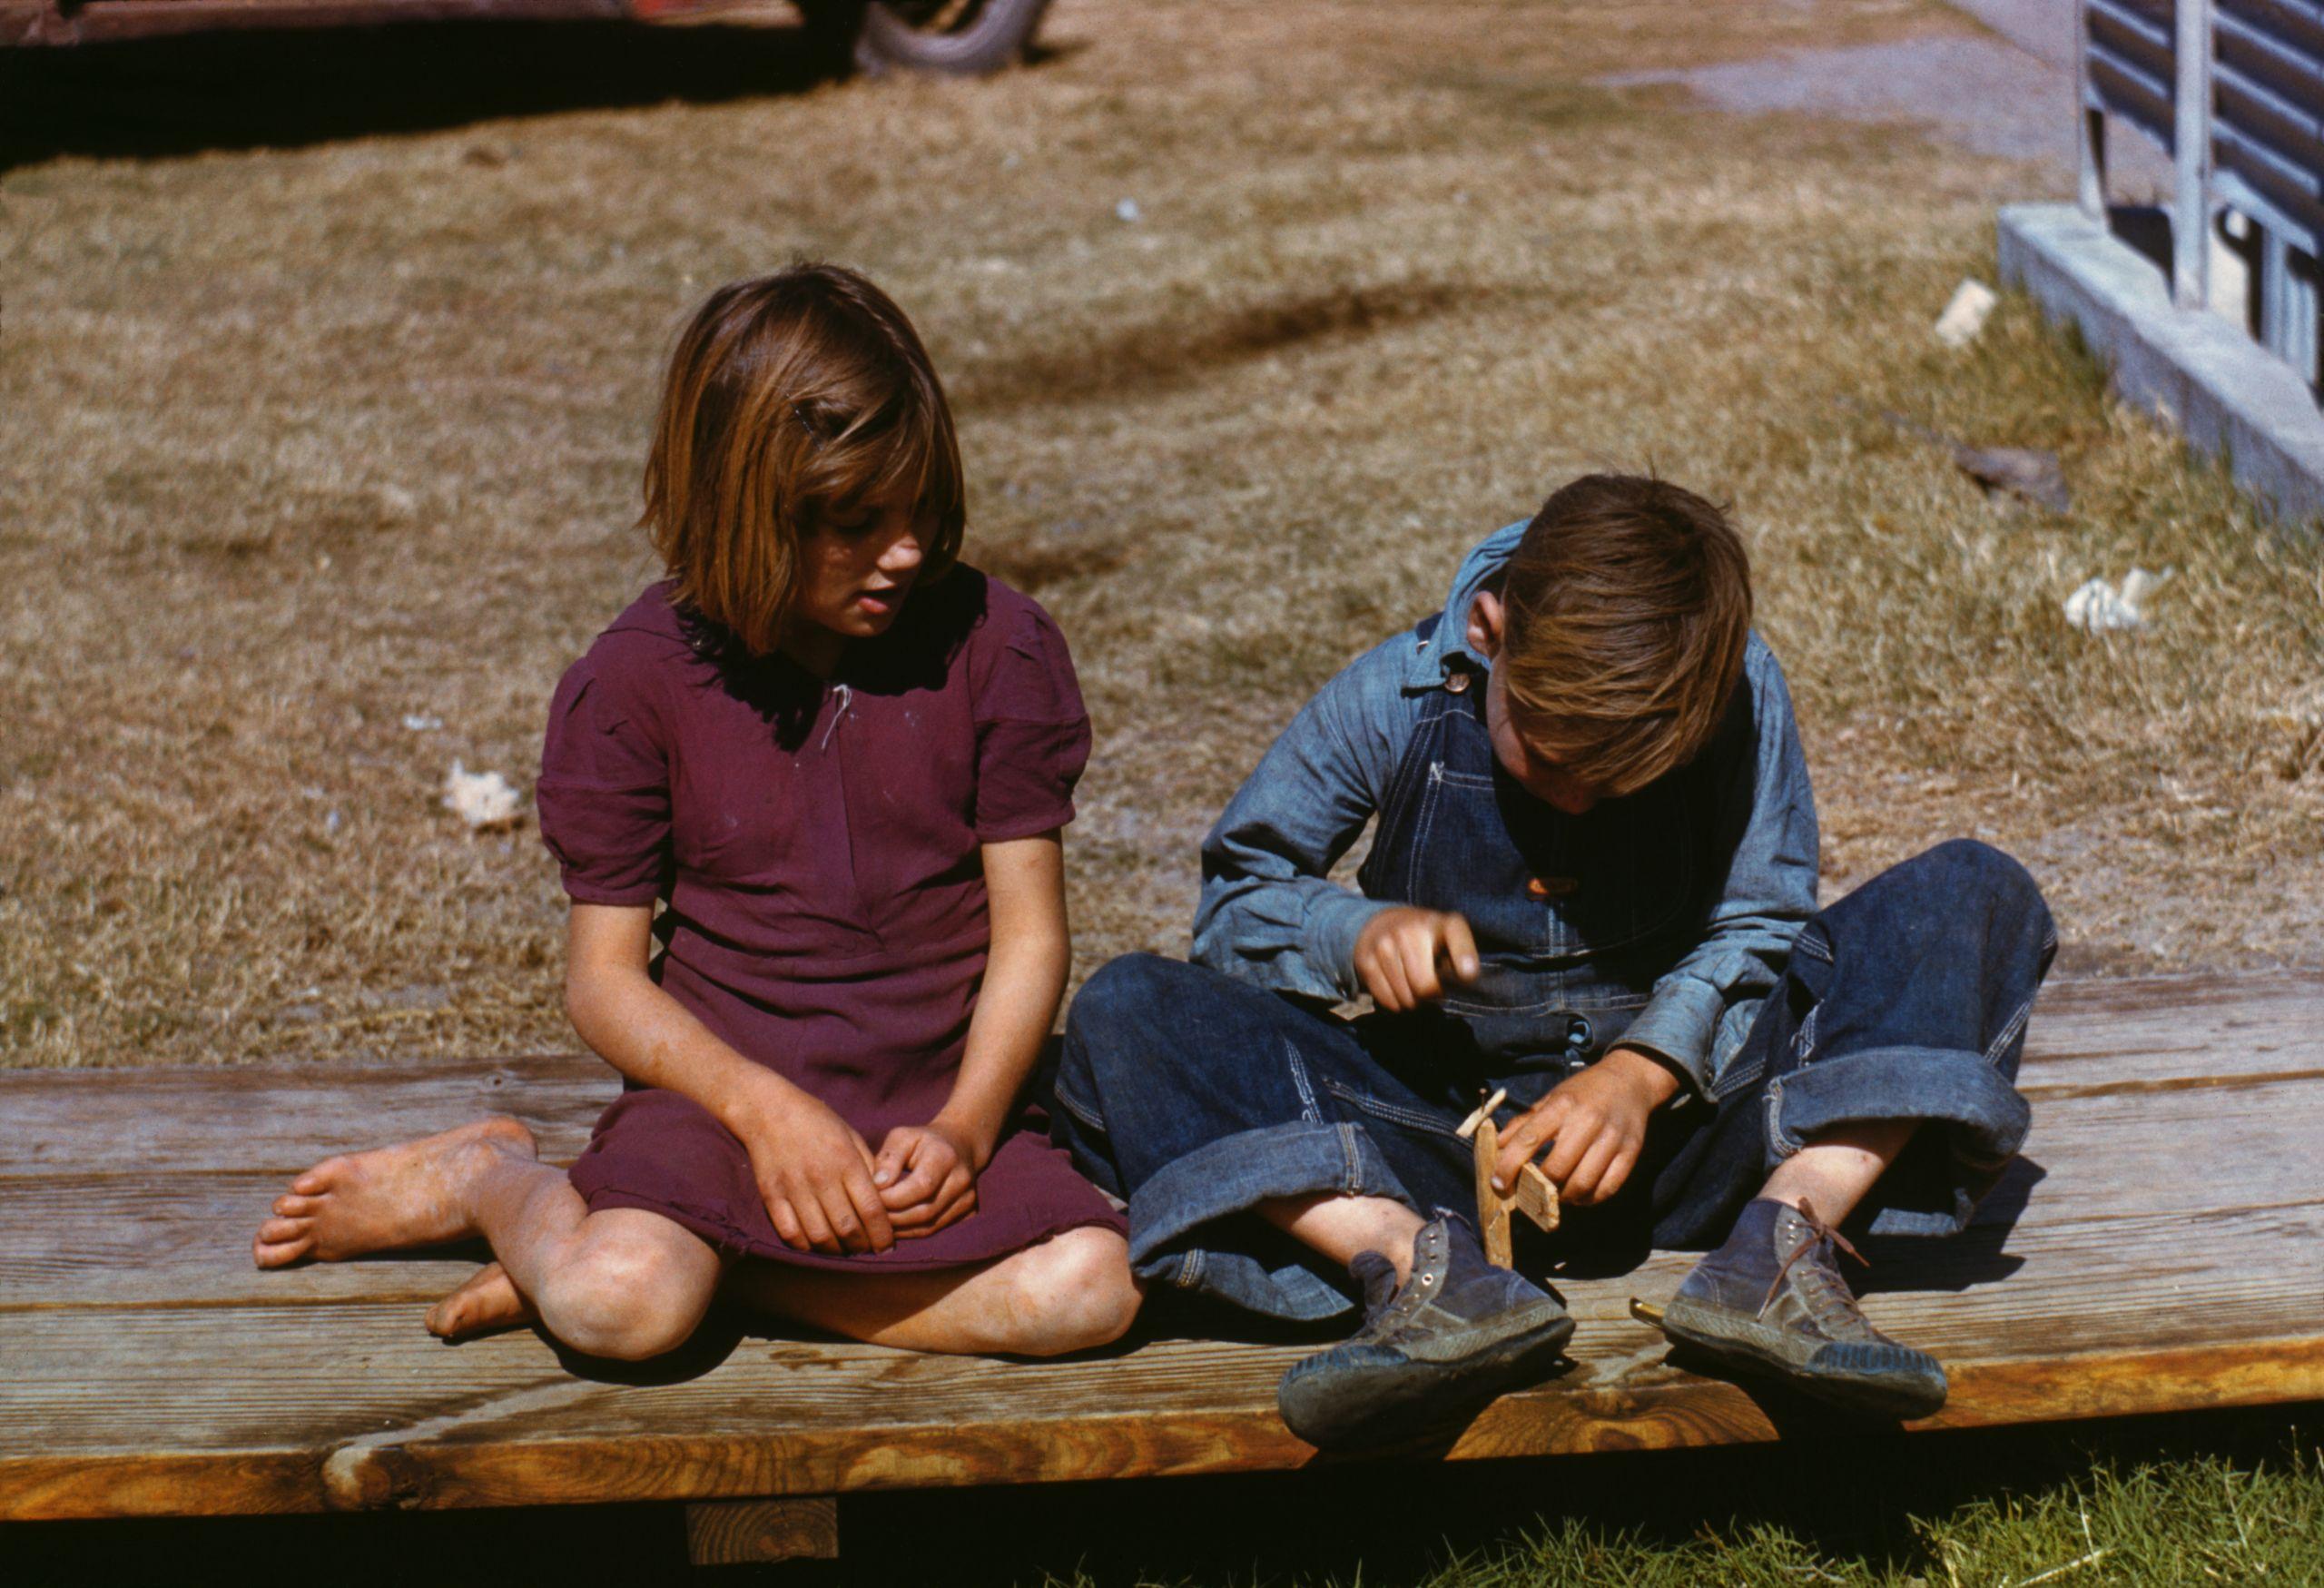 Arthur Rothstein Boy building a model airplane as girl watches FSA camp Robstown Texas 1942